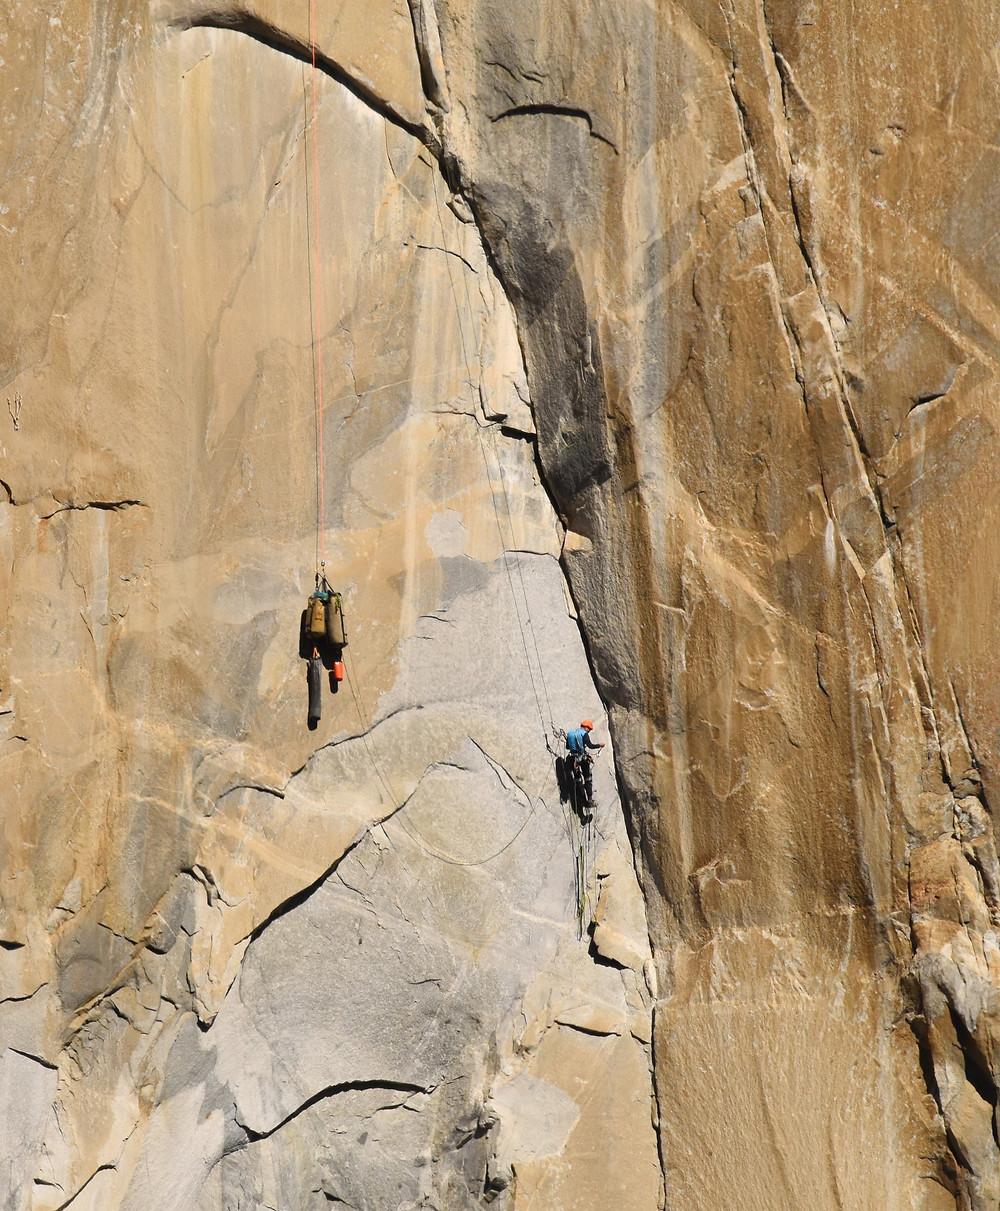 Hauling Bags on Padific Ocean Wall, El Capitan.